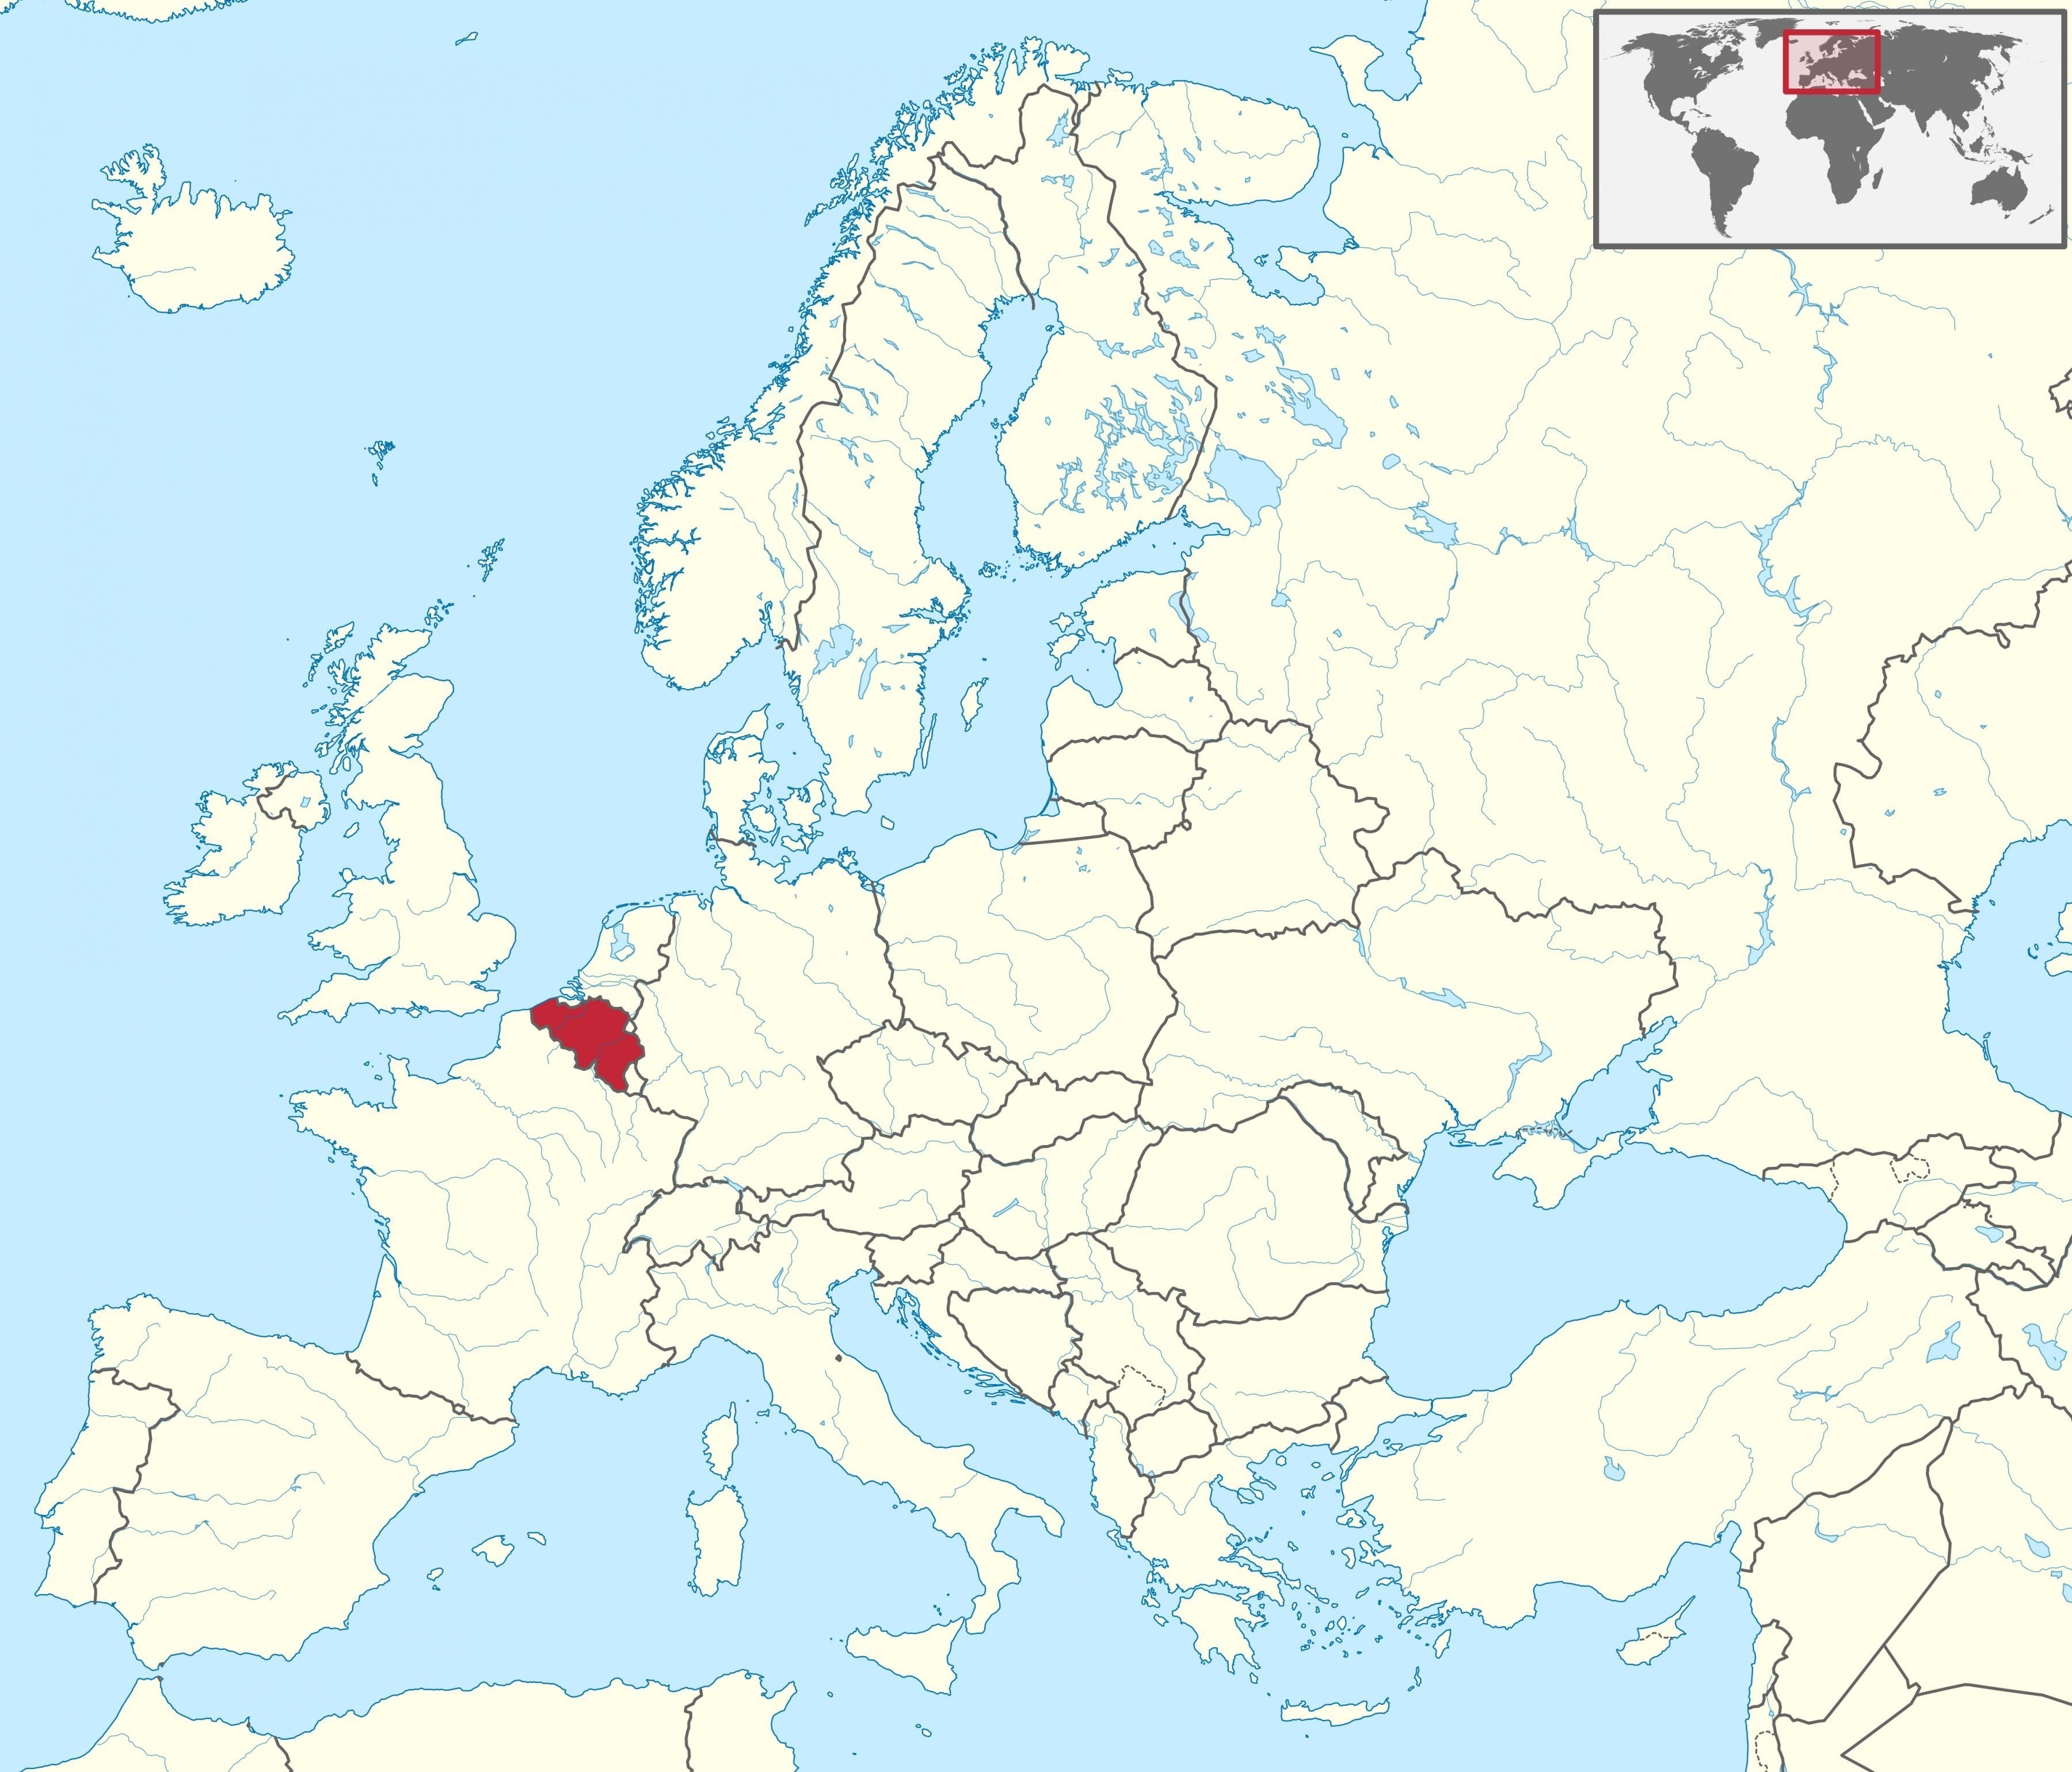 Cartina Fisica Belgio.Belgio Mappa Europa Mappa Del Belgio E D Europa Europa Occidentale Europa